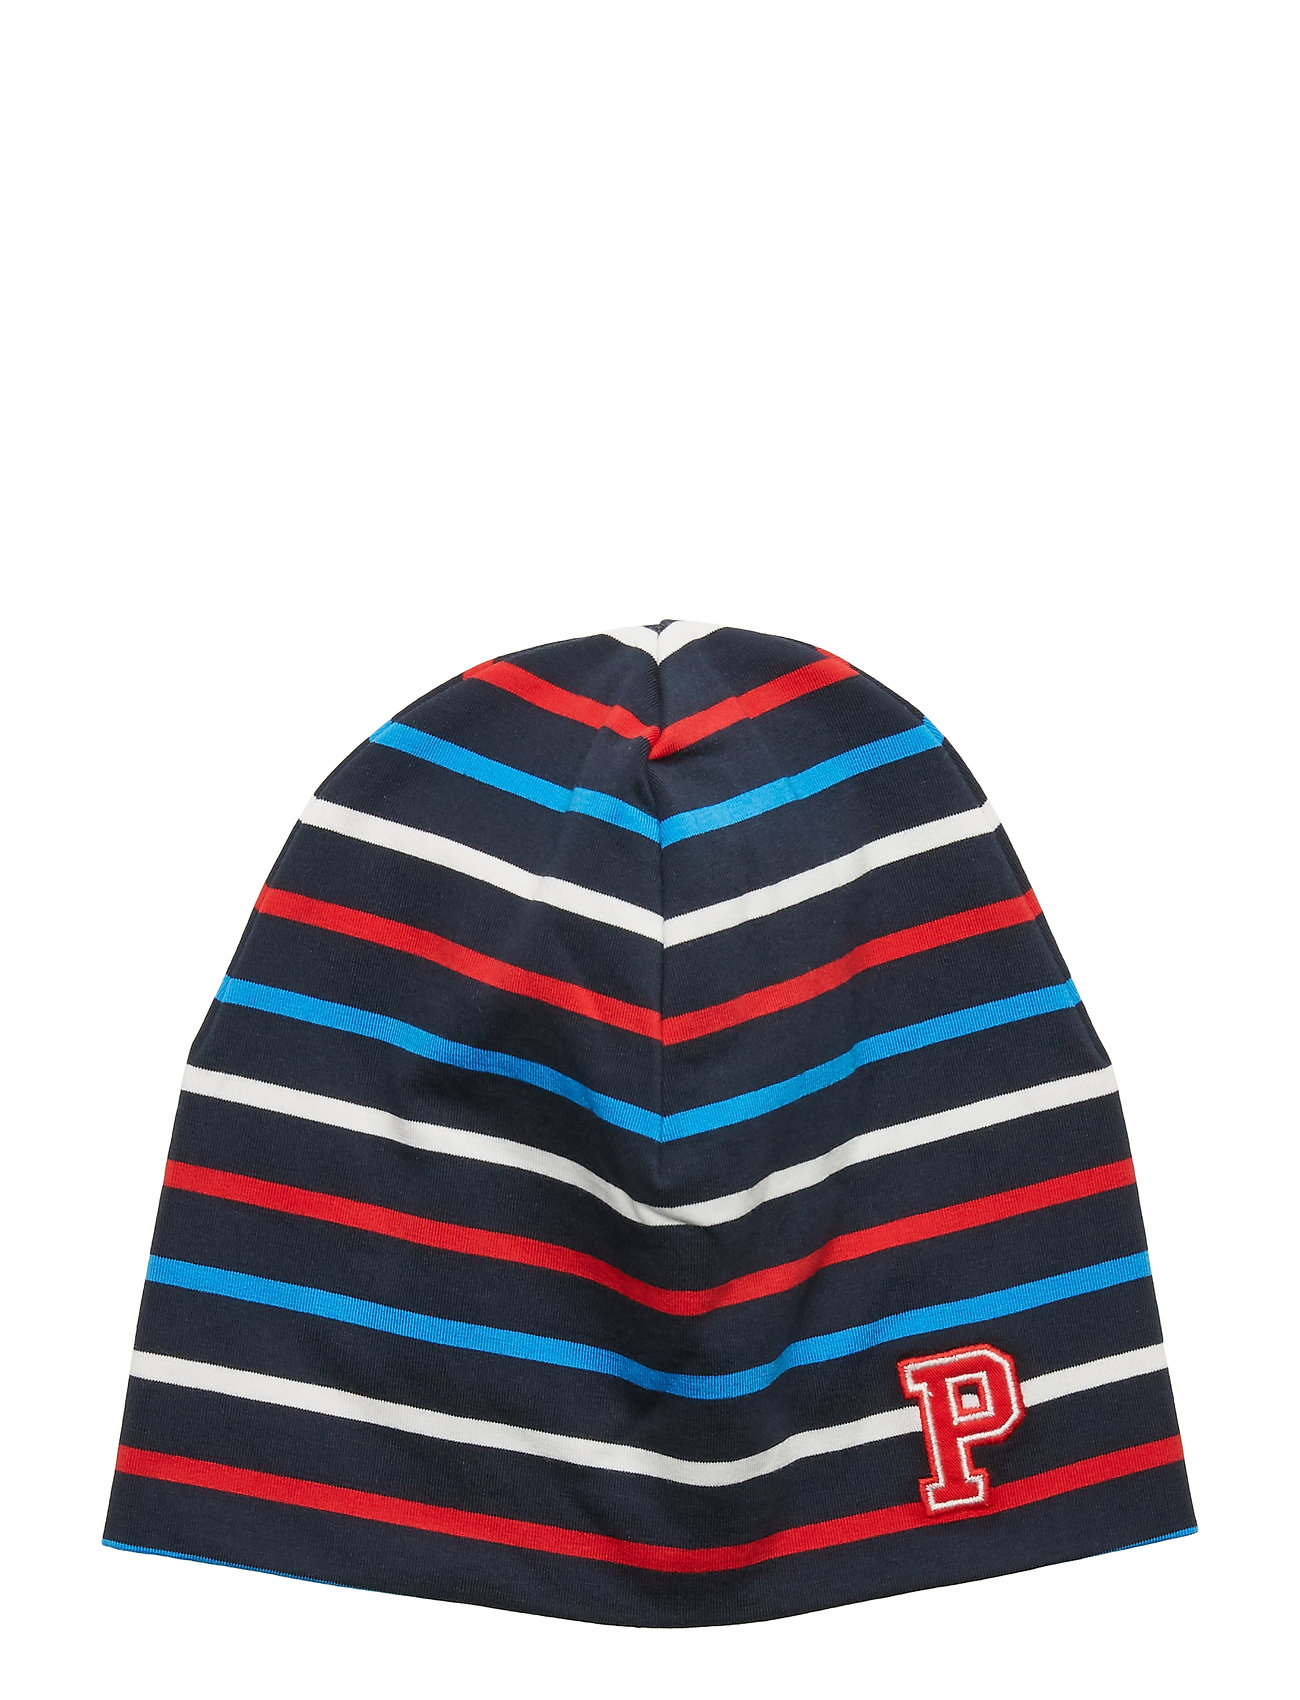 Polarn O. Pyret Cap Multi Stripe Preschool - DARK SAPPHIRE